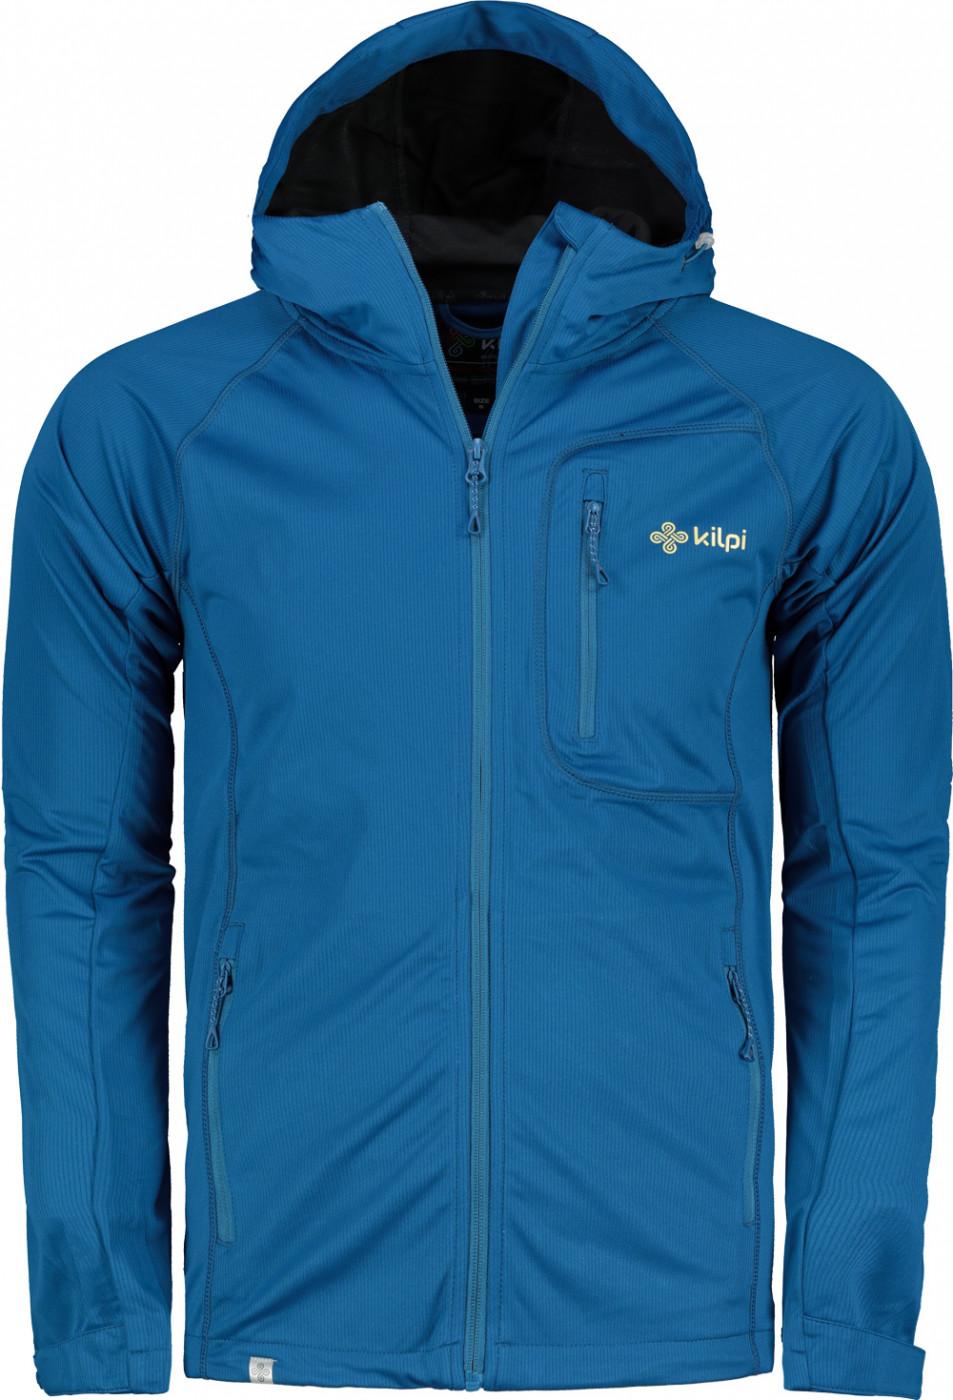 Men's jacket Kilpi ENYS-M